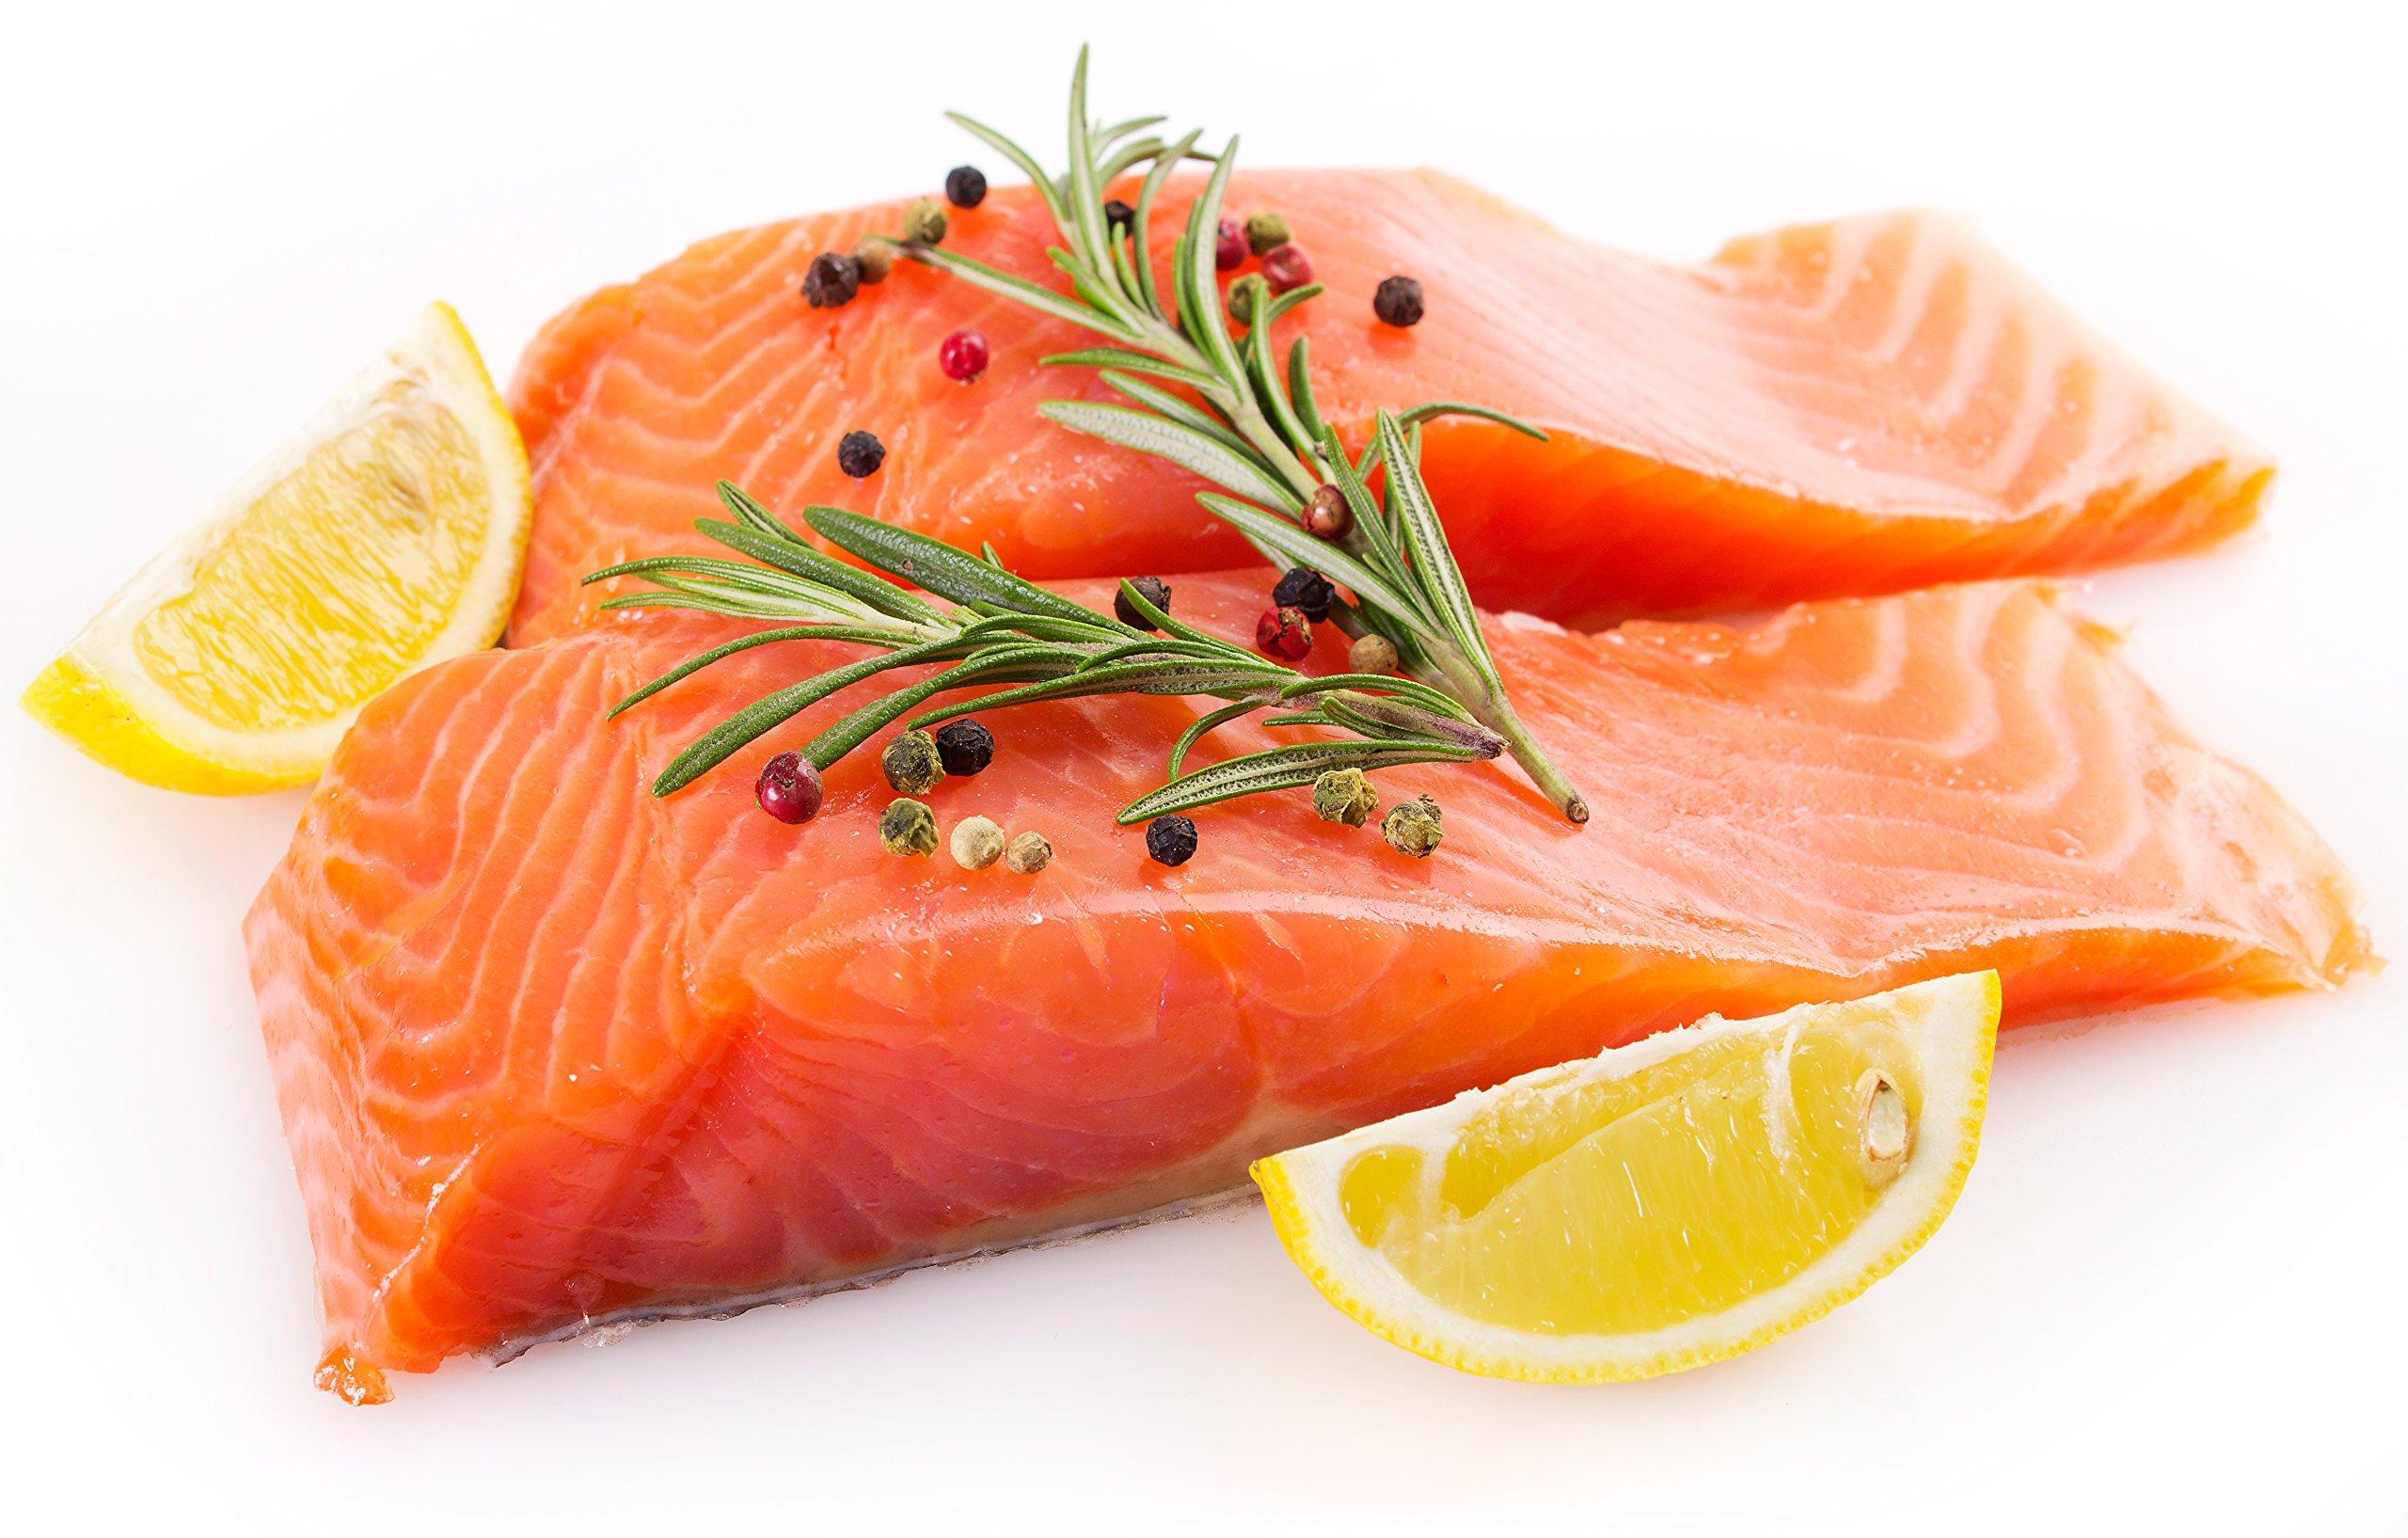 Alaskan Sockeye Salmon 5lbs by Tanner Inc.